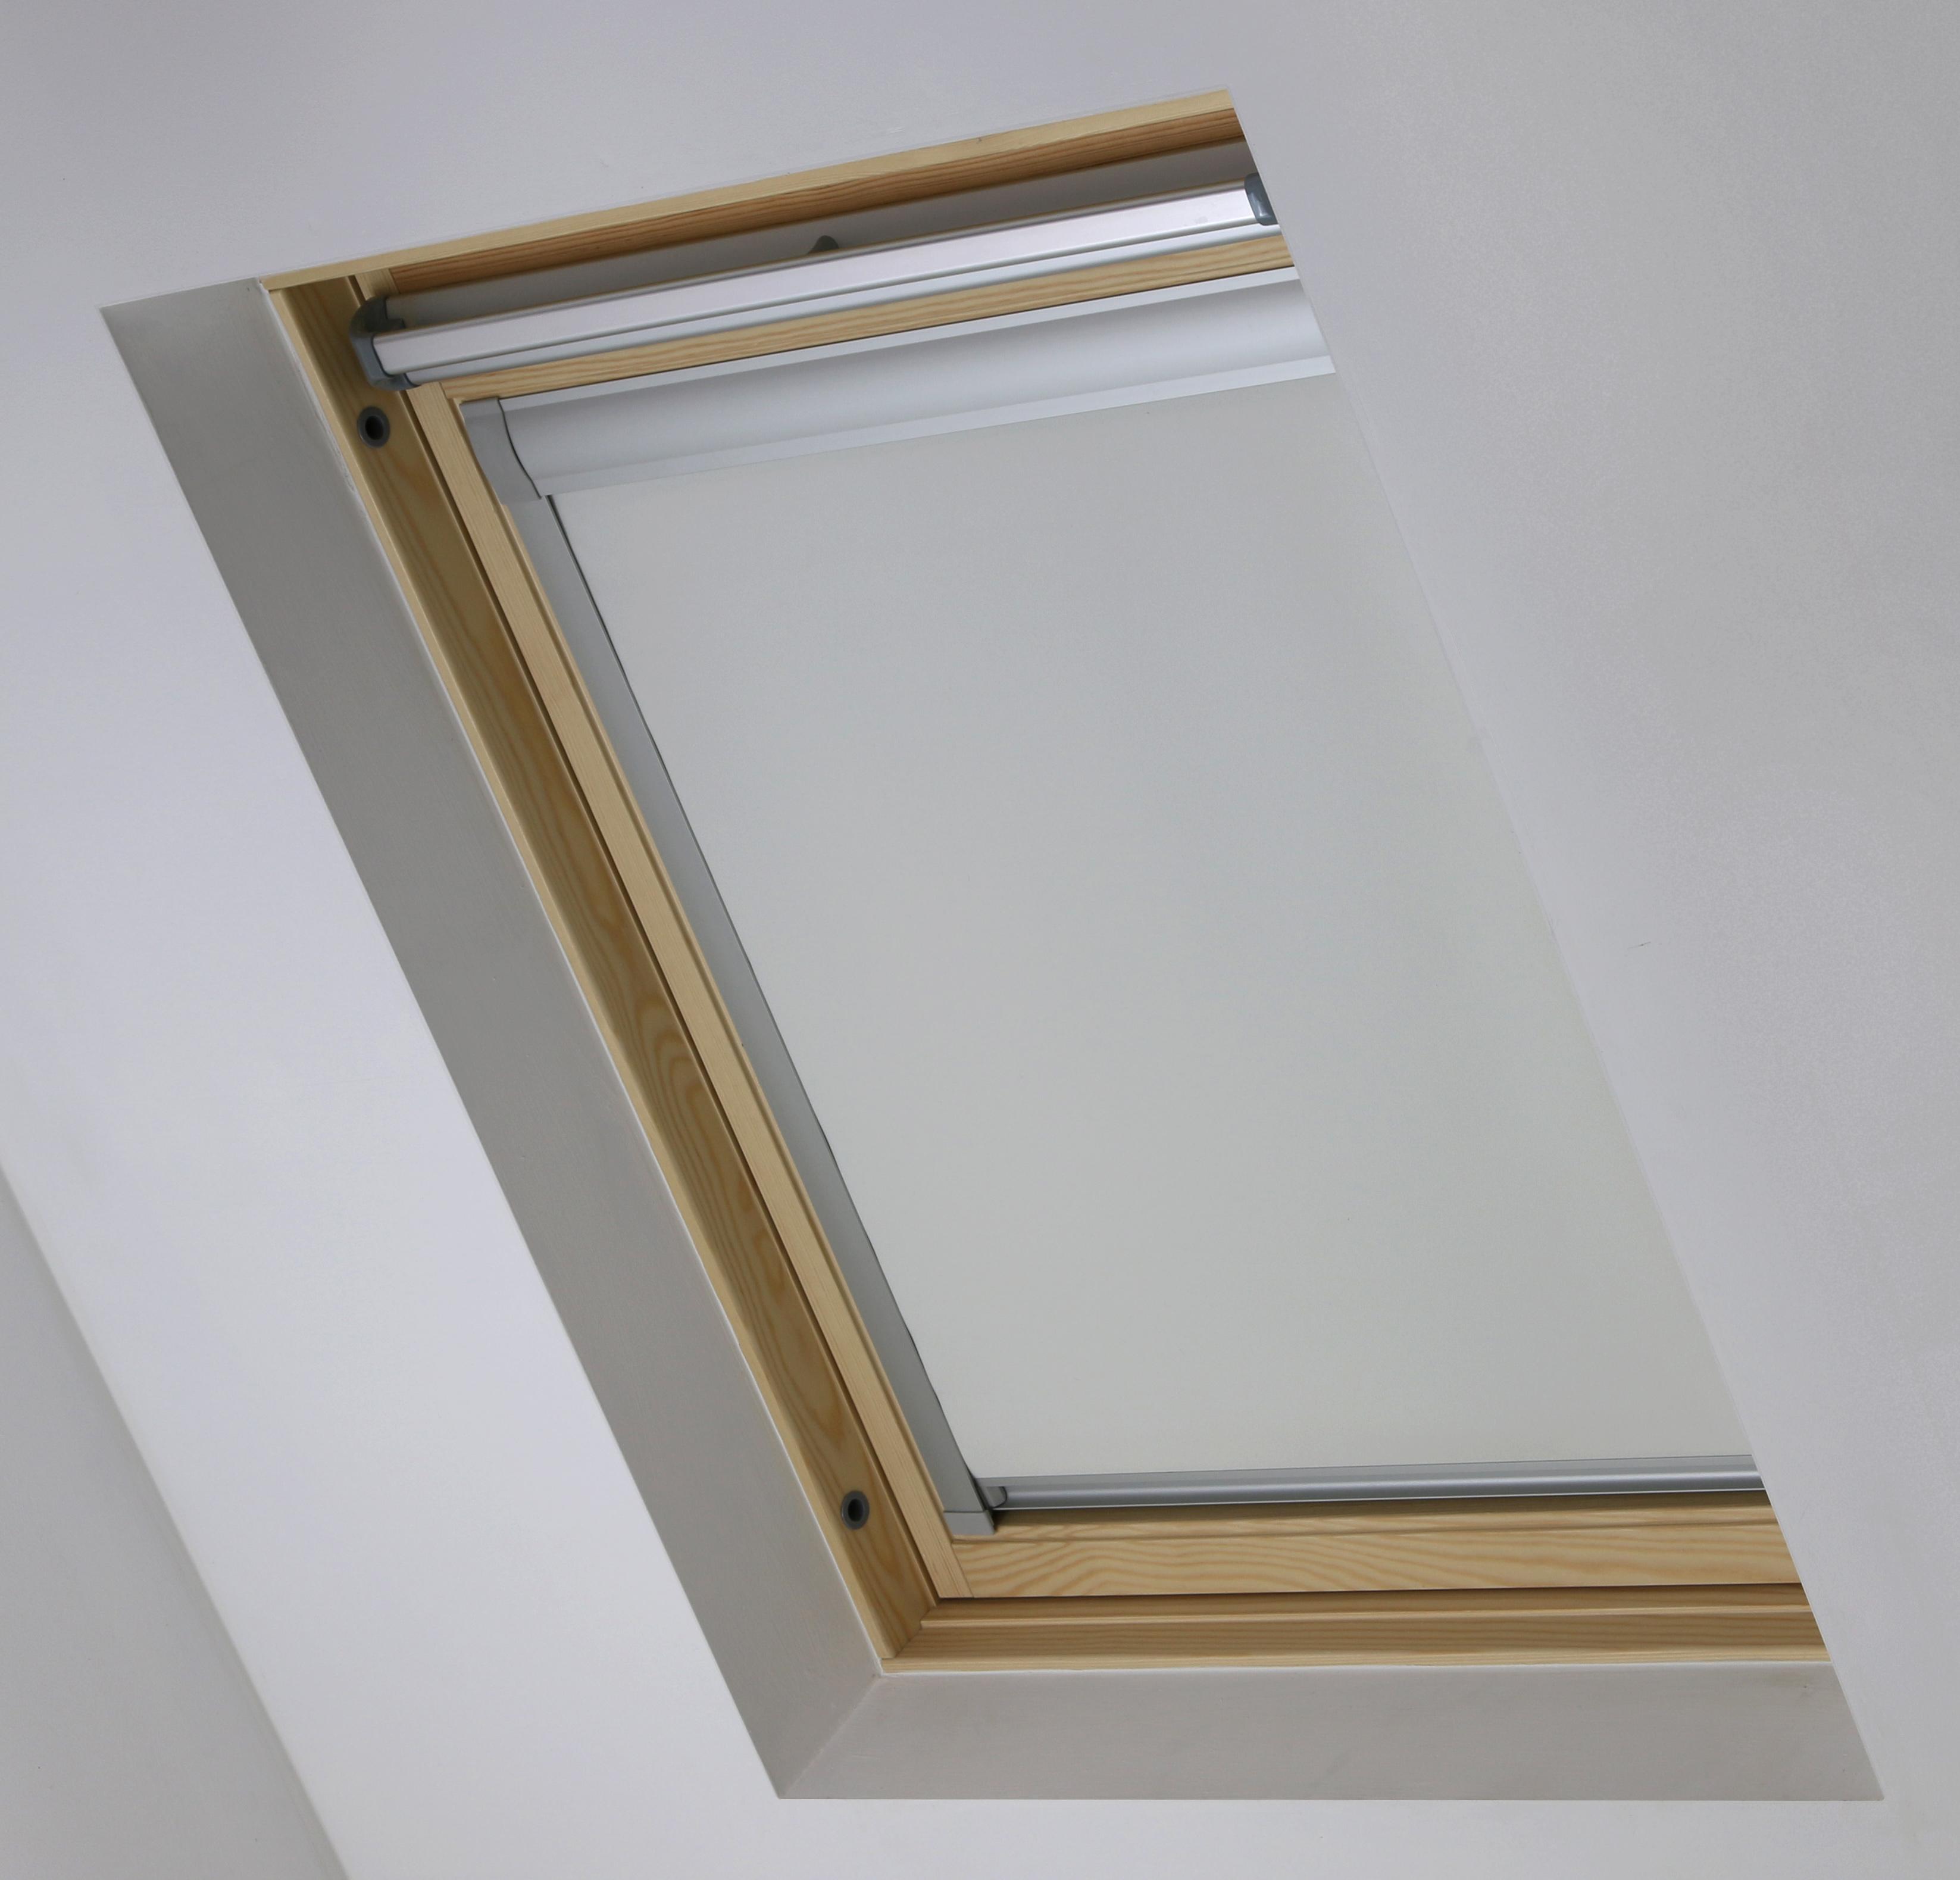 cordless skylight honeycomb shade savalan img window blackout blinds decor